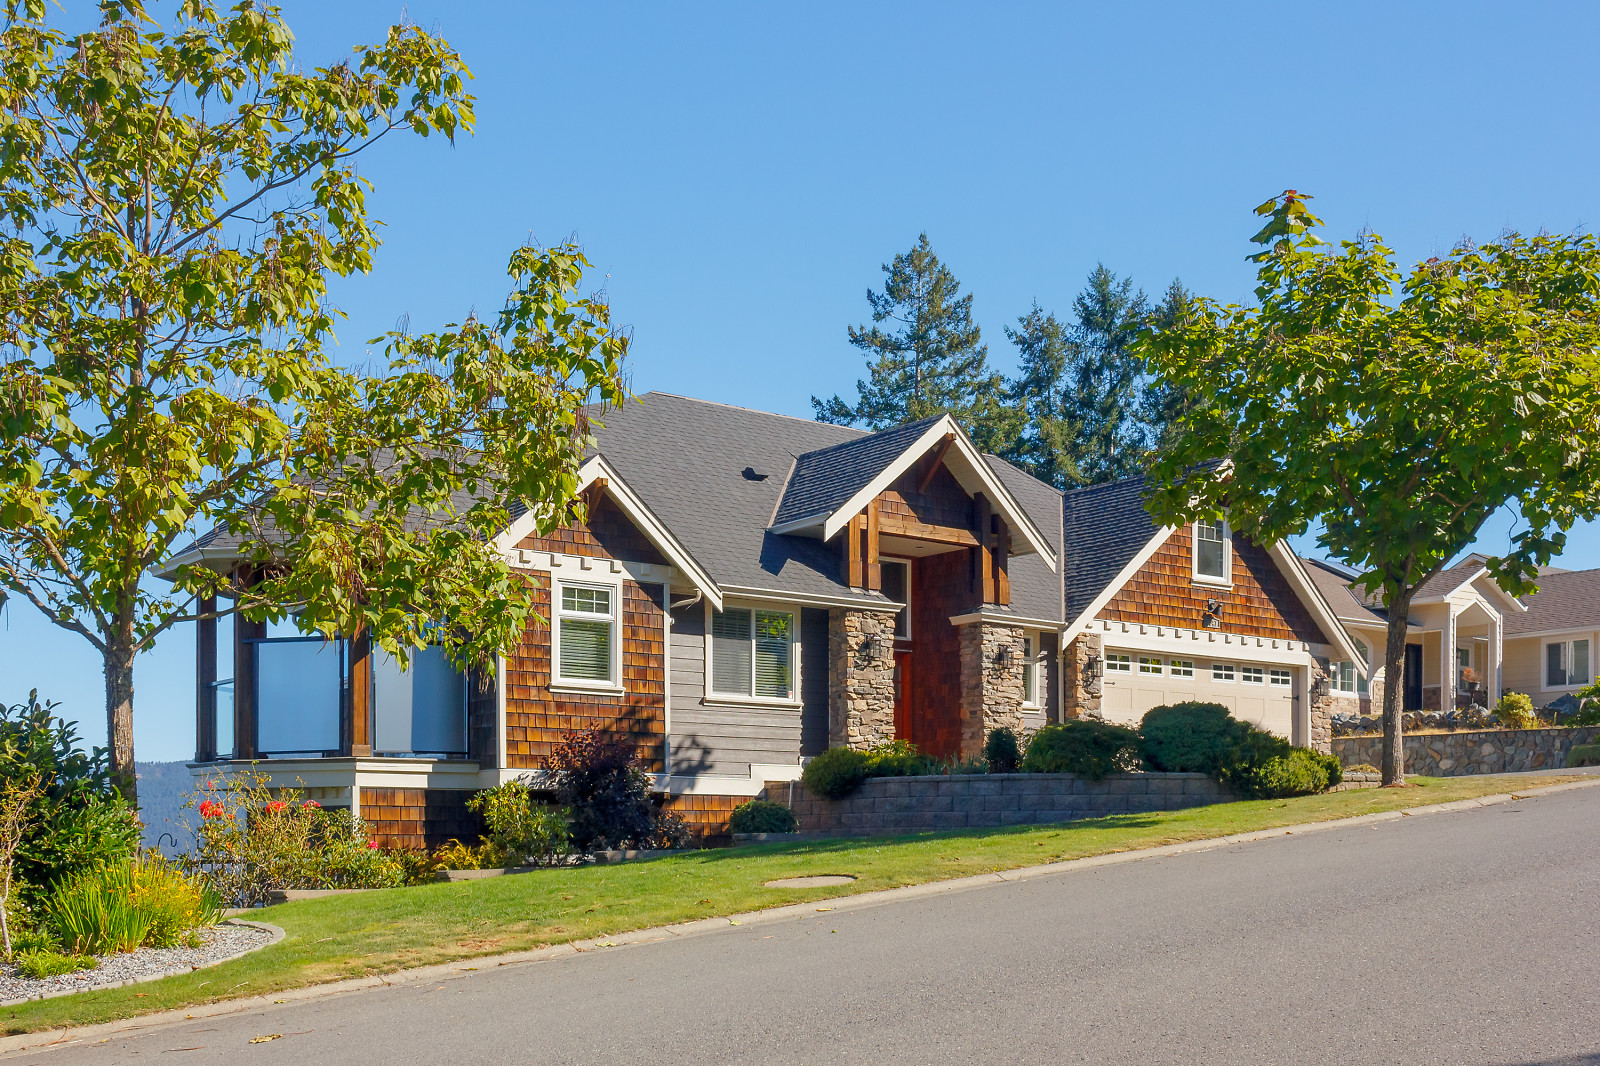 6047 Kaspa Rd, duncan, British Columbia